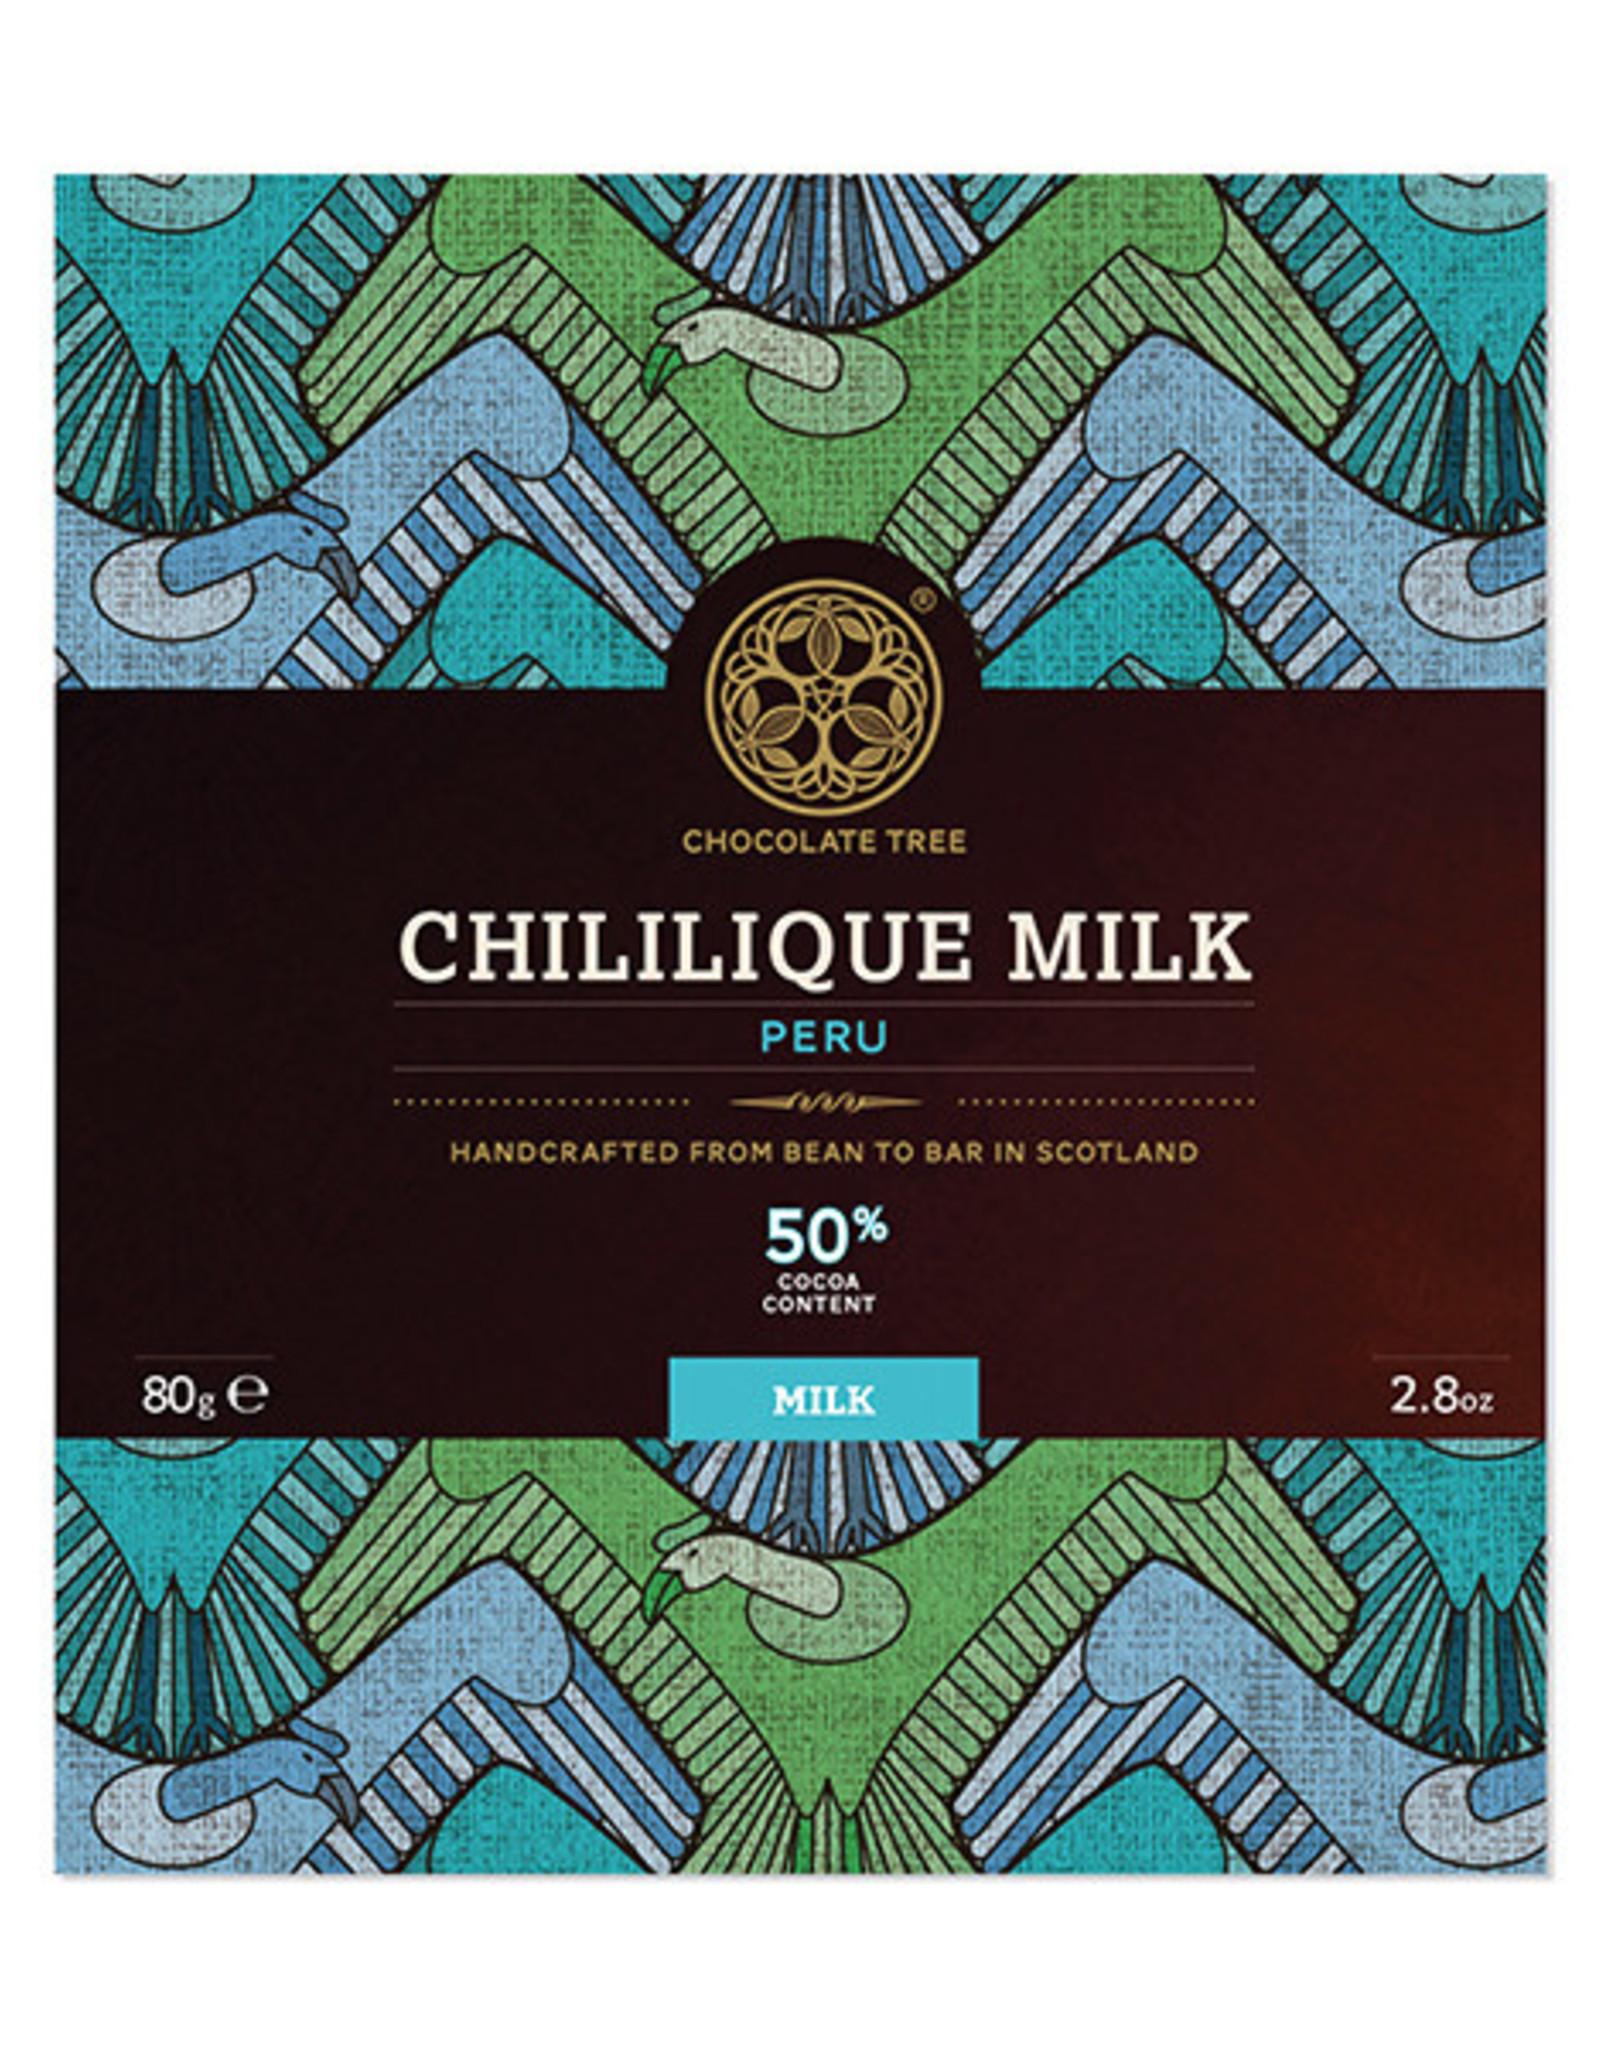 Chocolate tree, Scotland Chocolate Tree Chililique Milk 50%